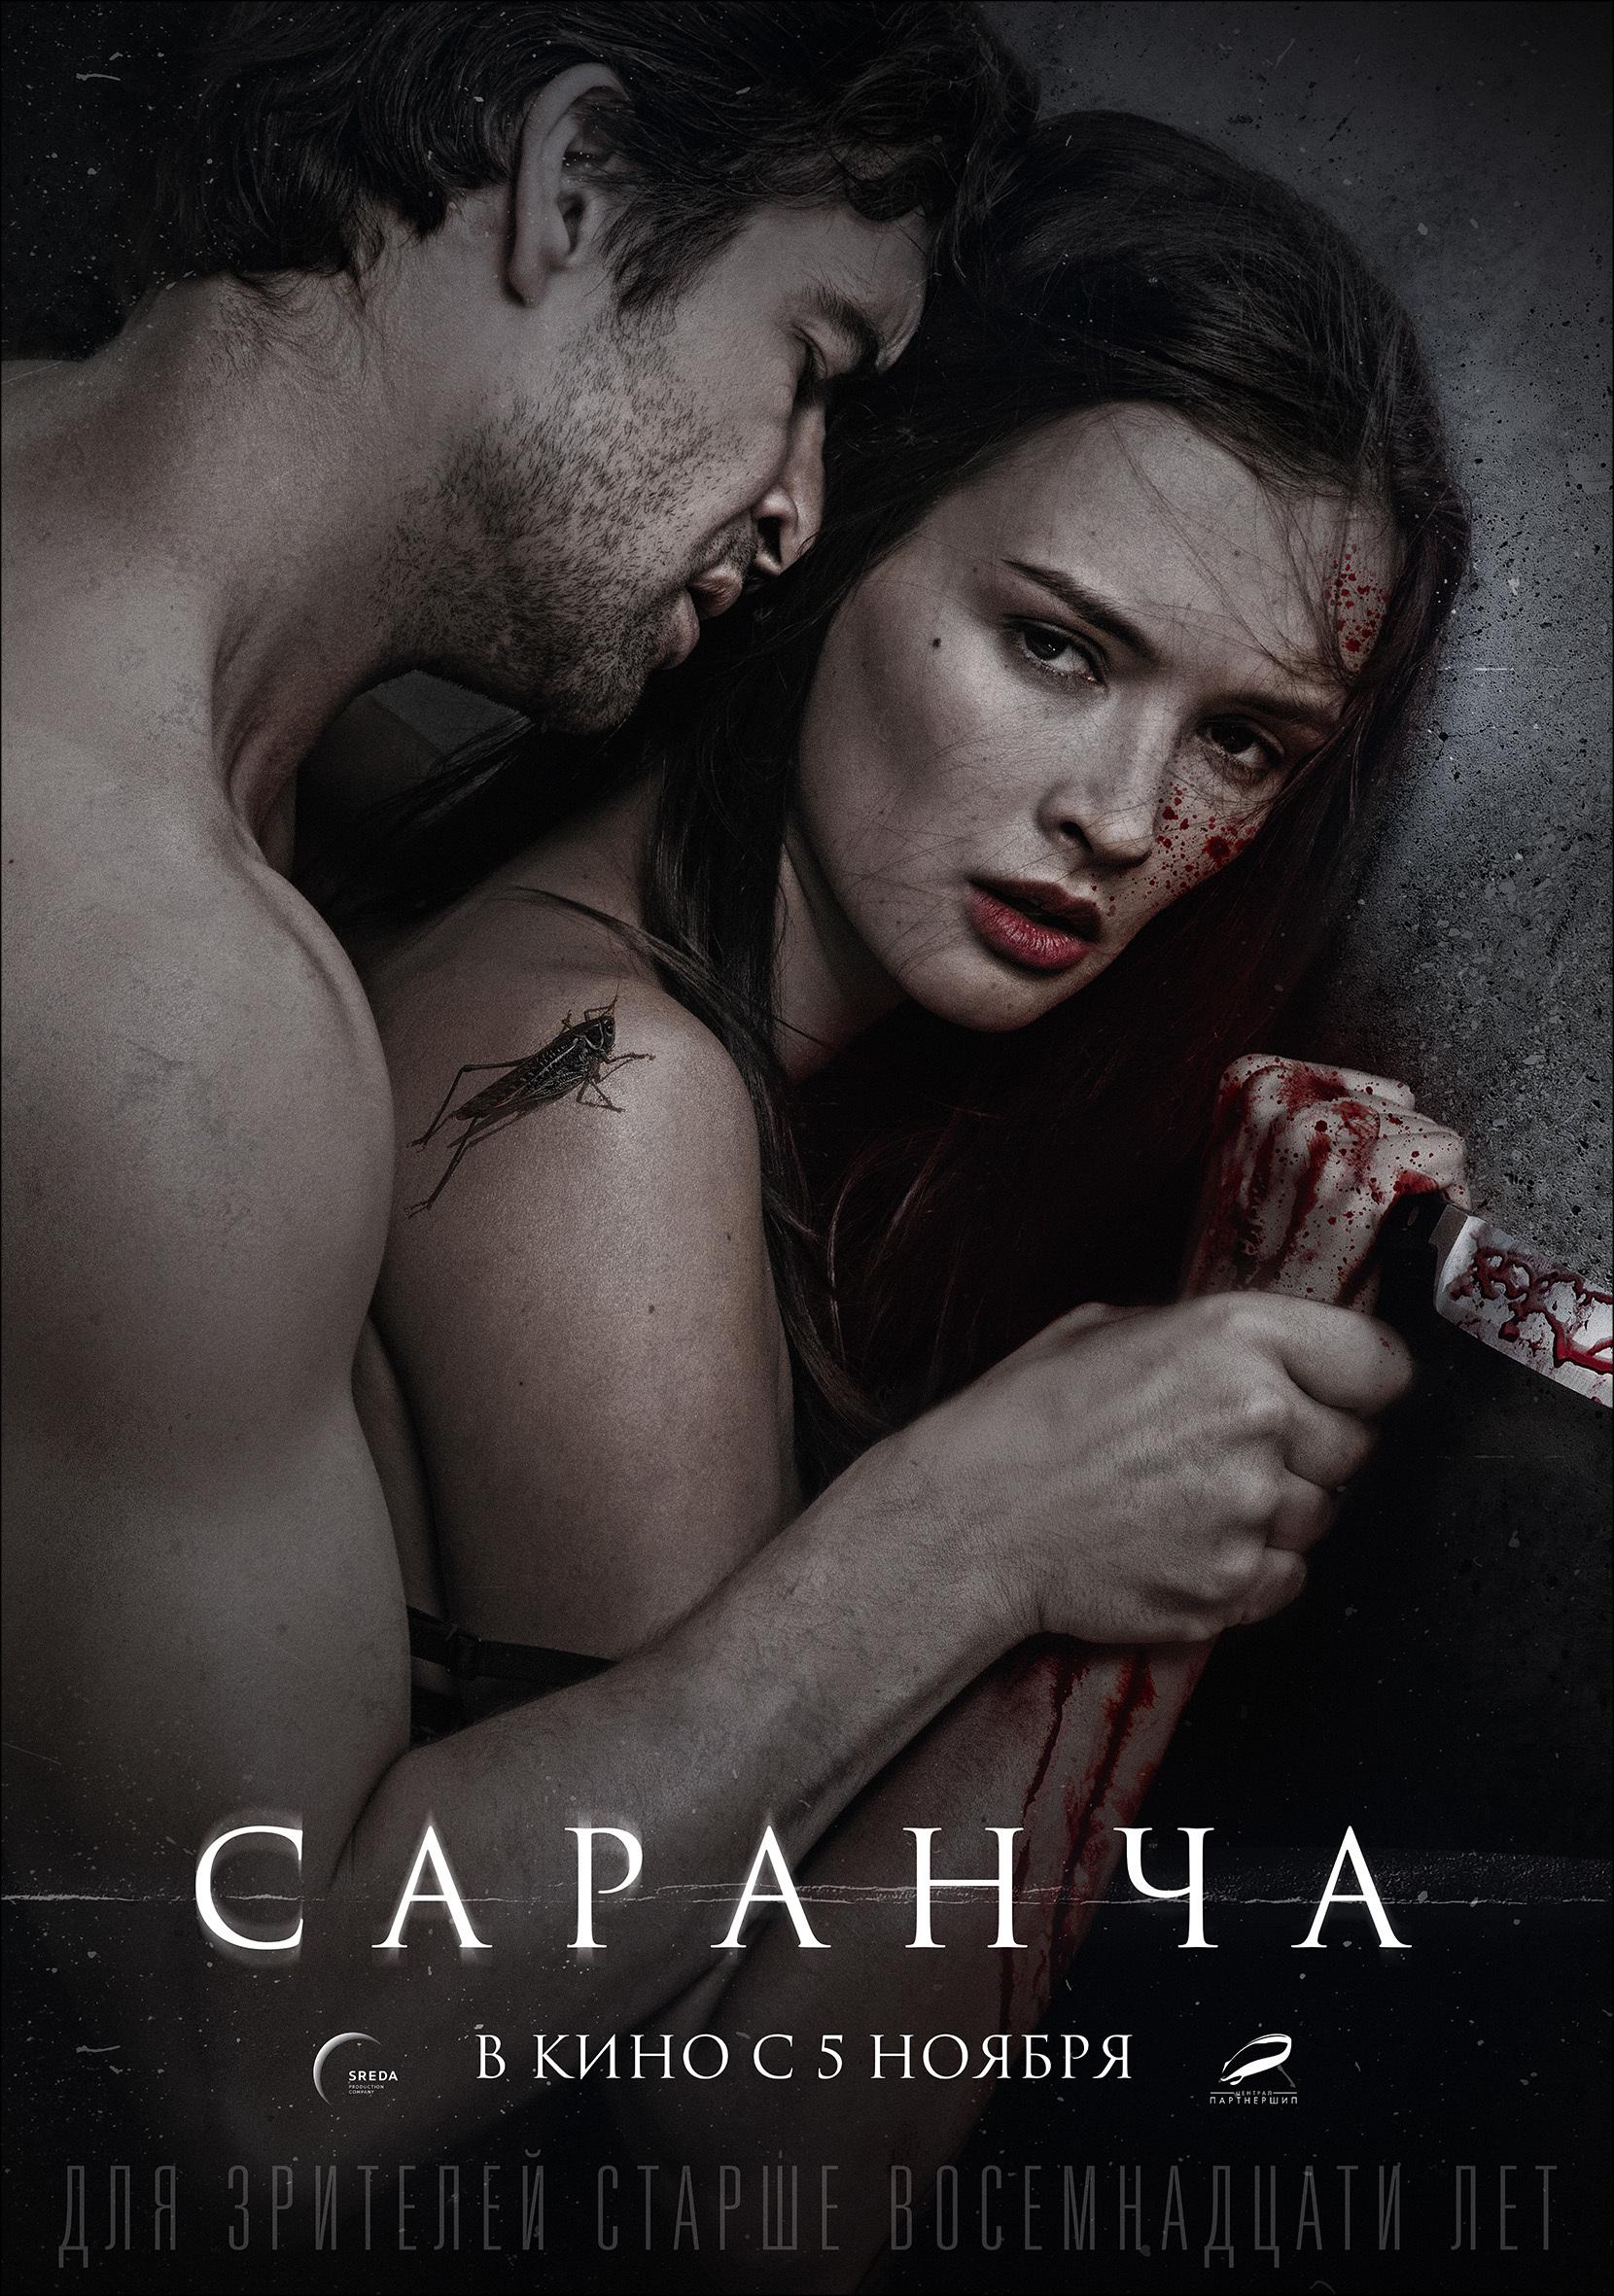 Russian erotic film